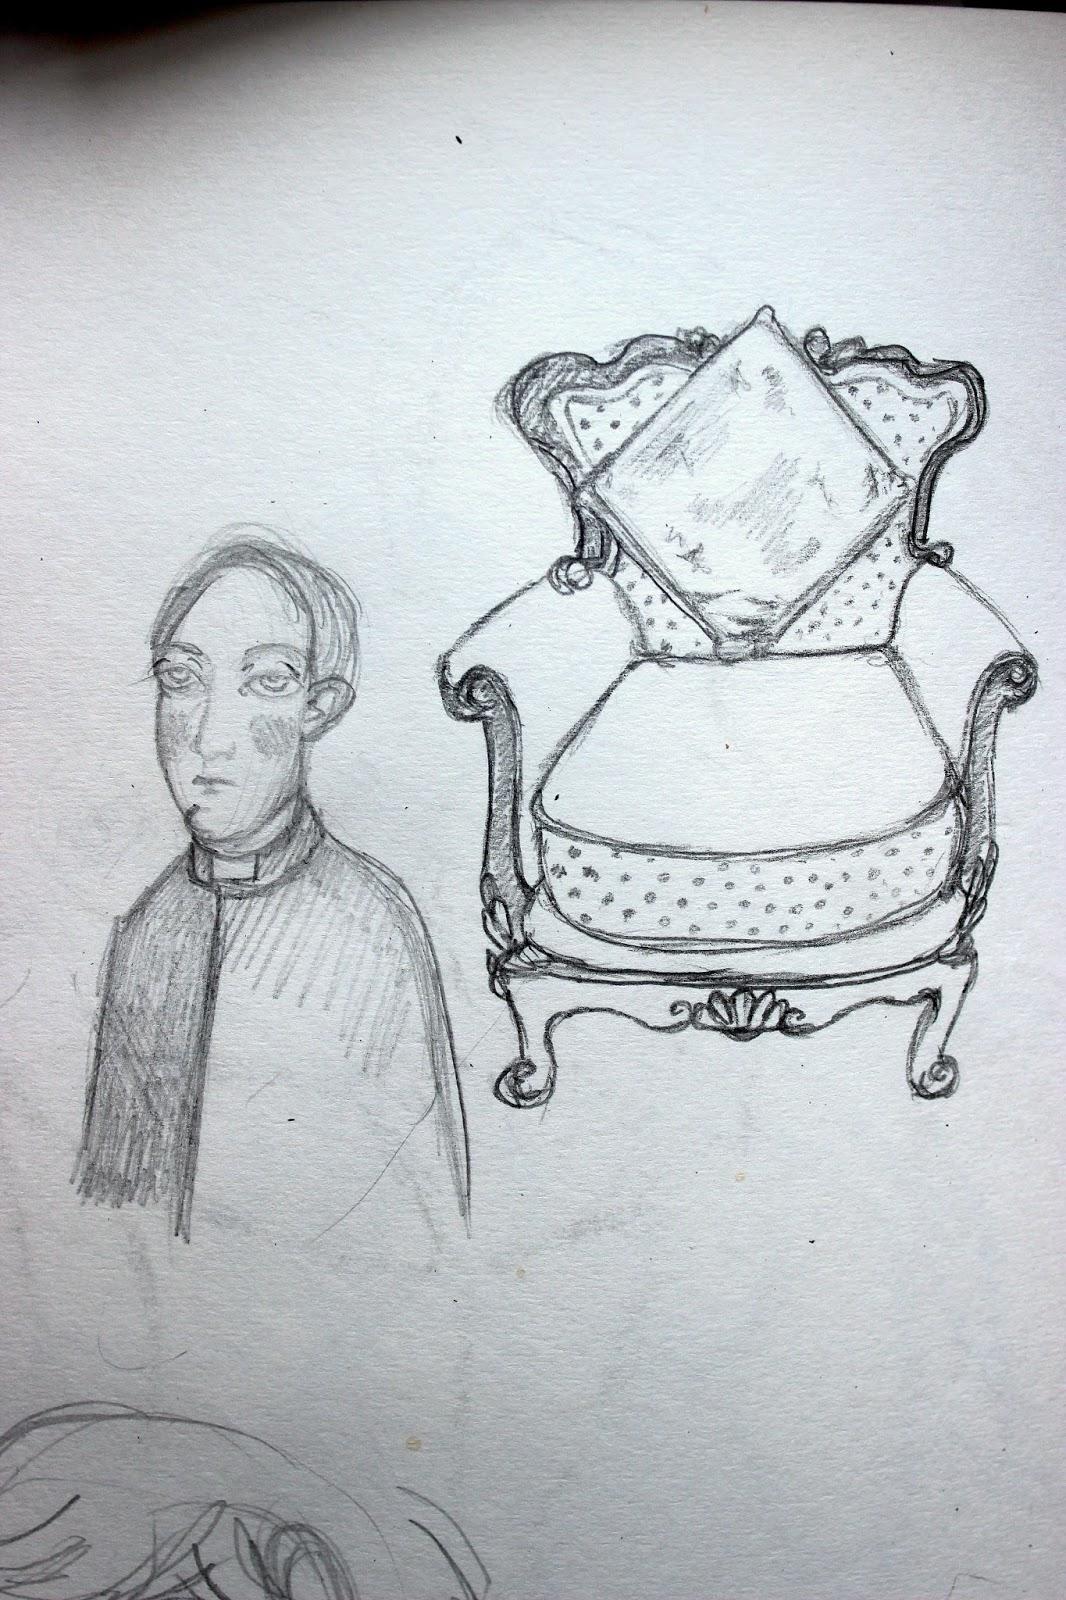 Sketchpad Notebook Sketch Drawing Pencil Priest Armchair